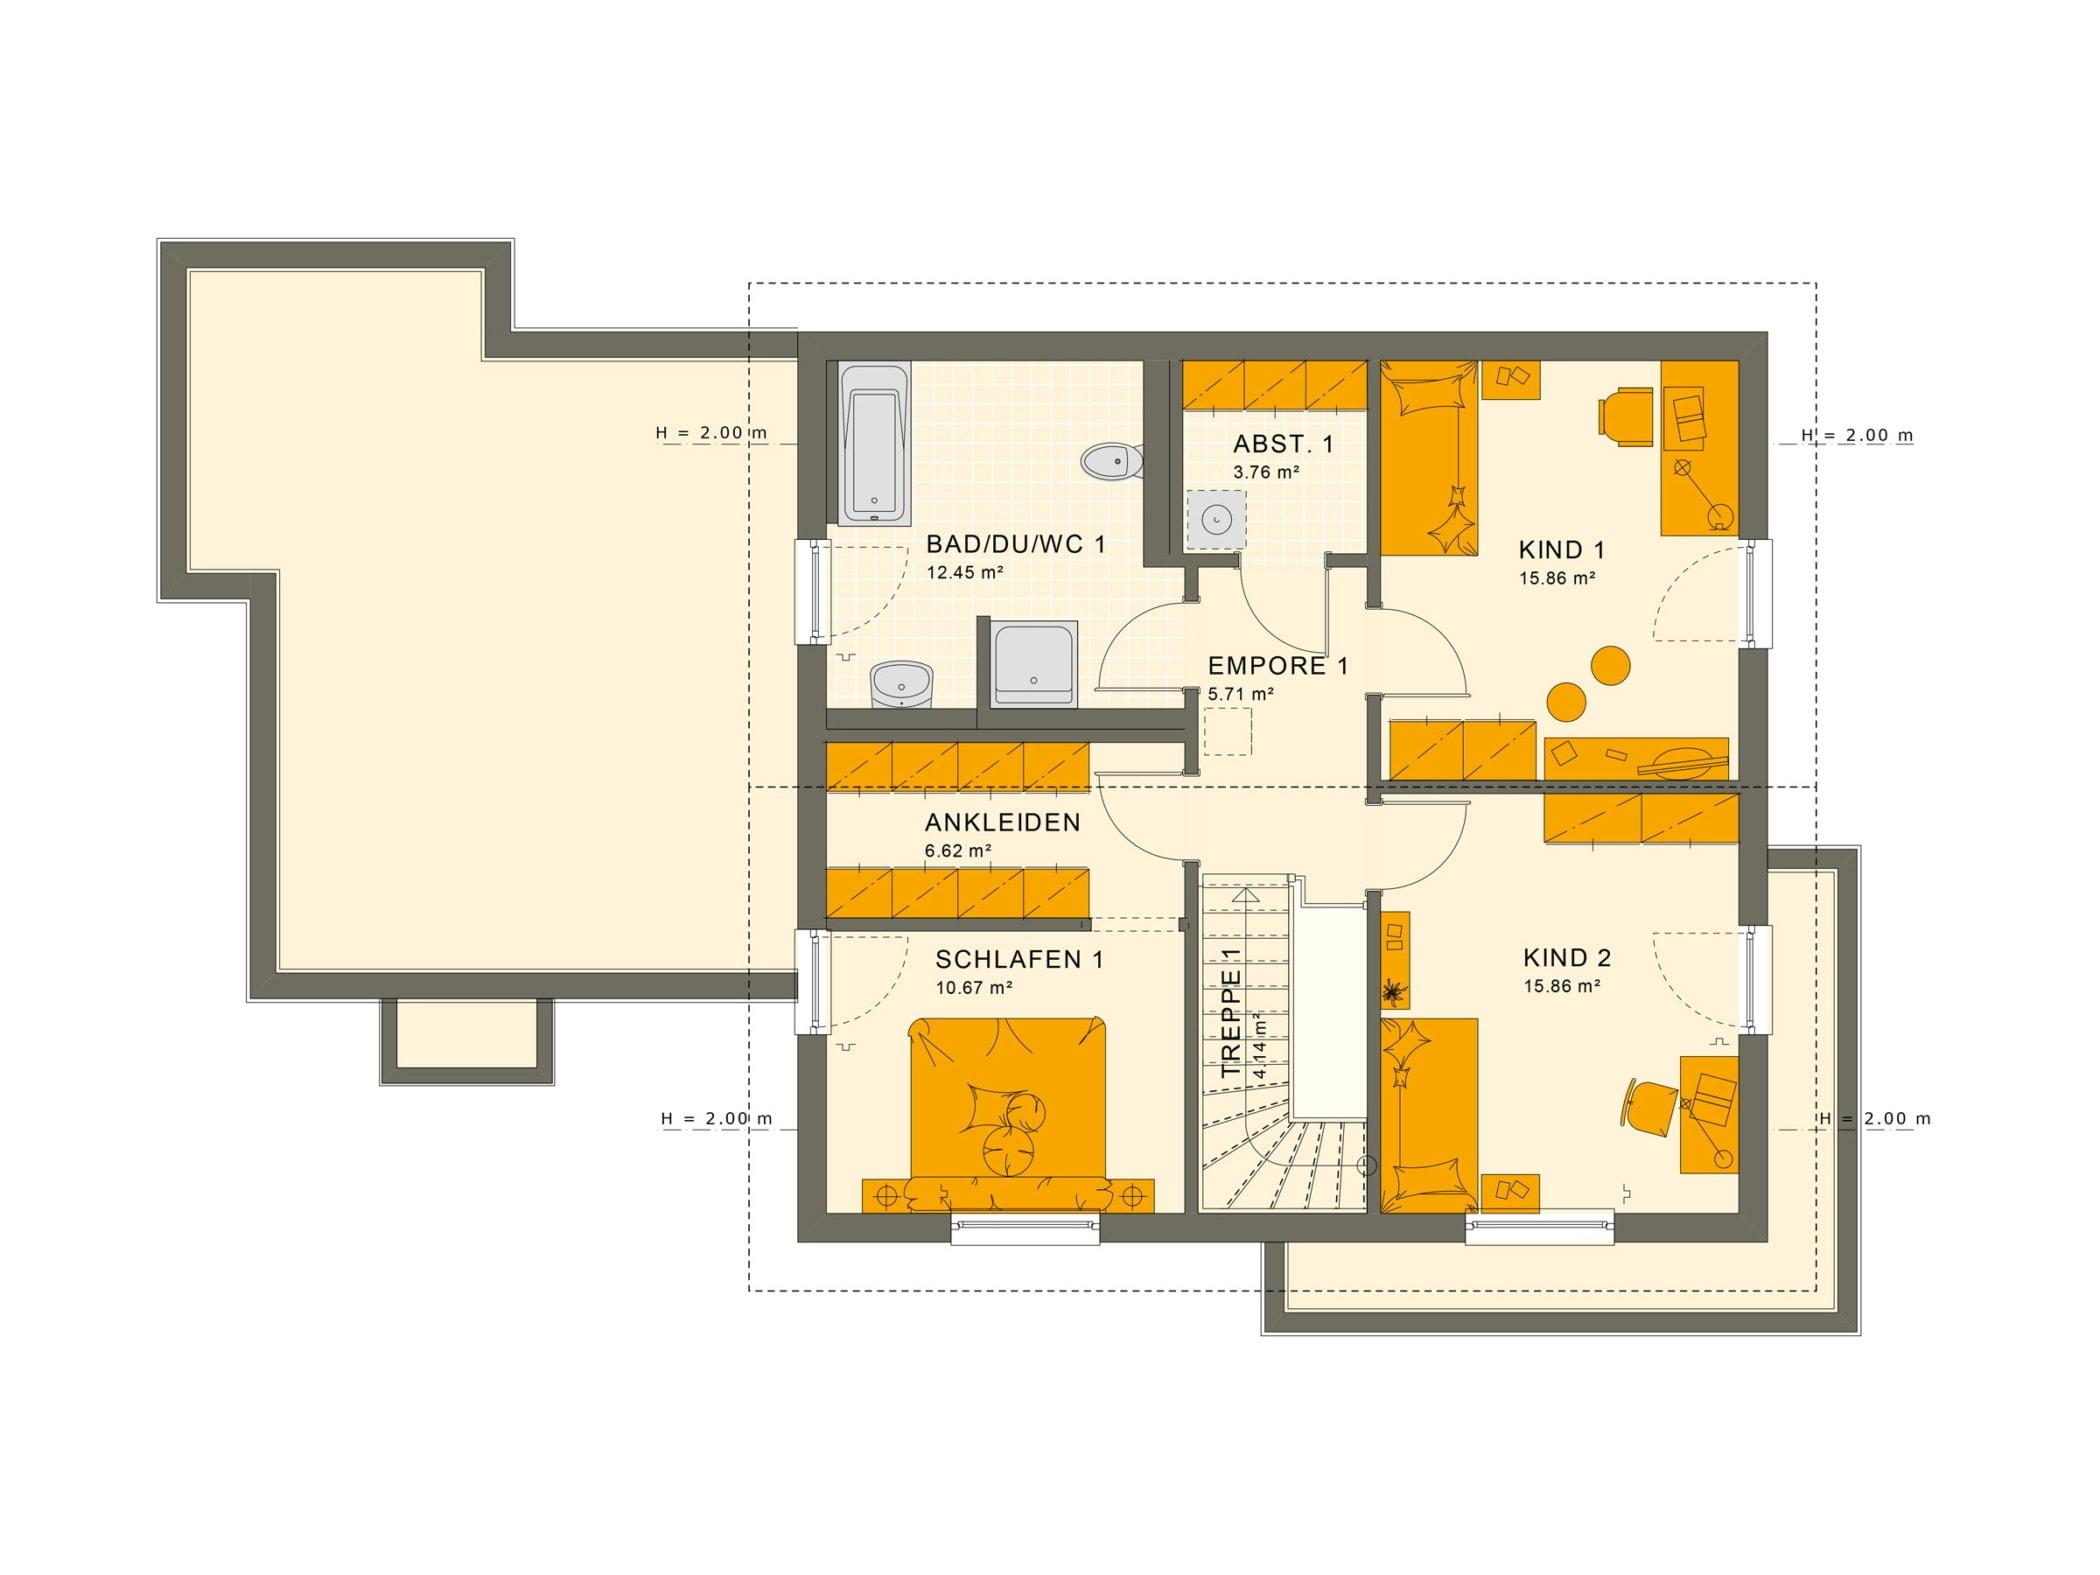 Grundriss Einfamilienhaus mit Einliegerwohnung im Anbau, Dachgeschoss - Fertighaus schlüsselfertig bauen Ideen Living Haus SOLUTION 183 V5 - HausbauDirekt.de